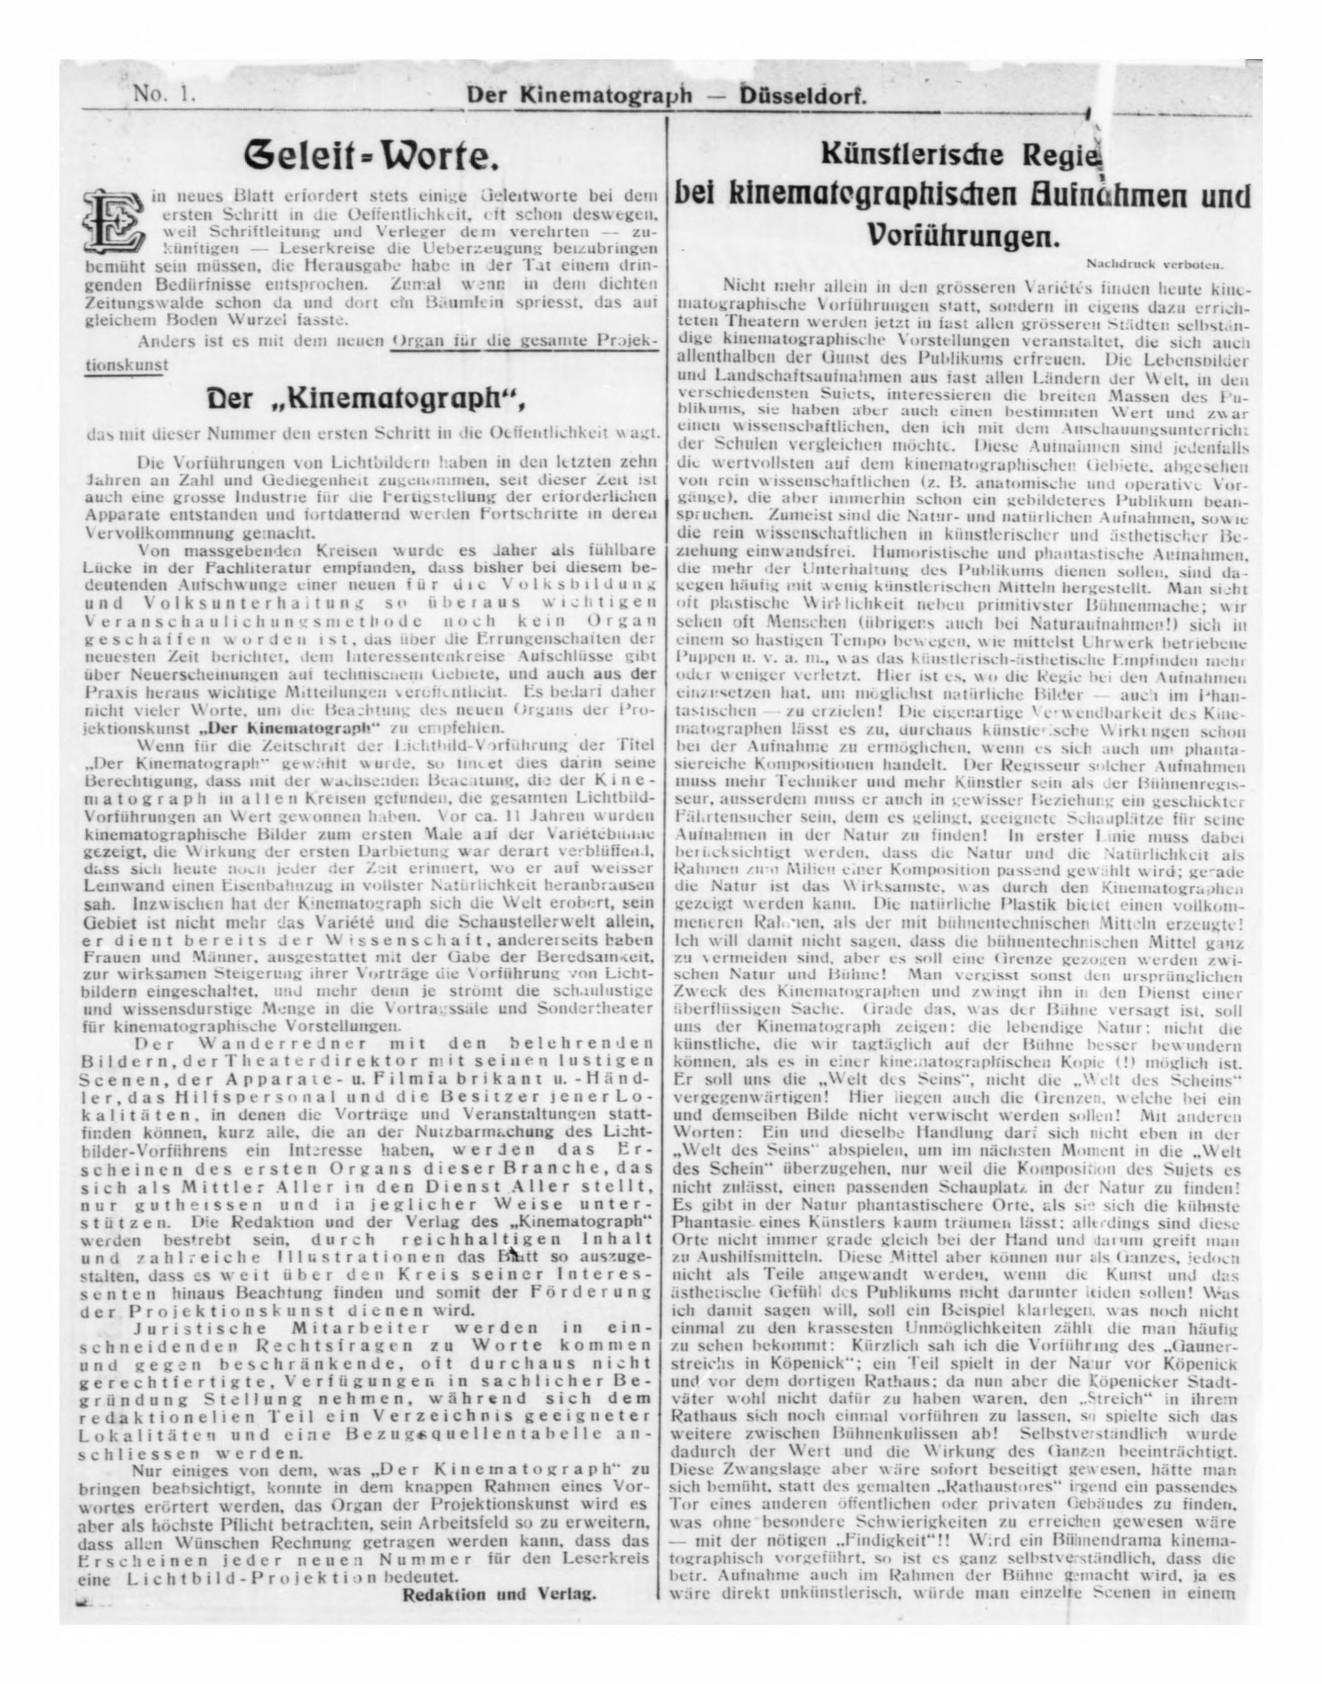 Kinematograph01-1907-01_jp2.zip&file=kinematograph01-1907-01_jp2%2fkinematograph01-1907-01_0001